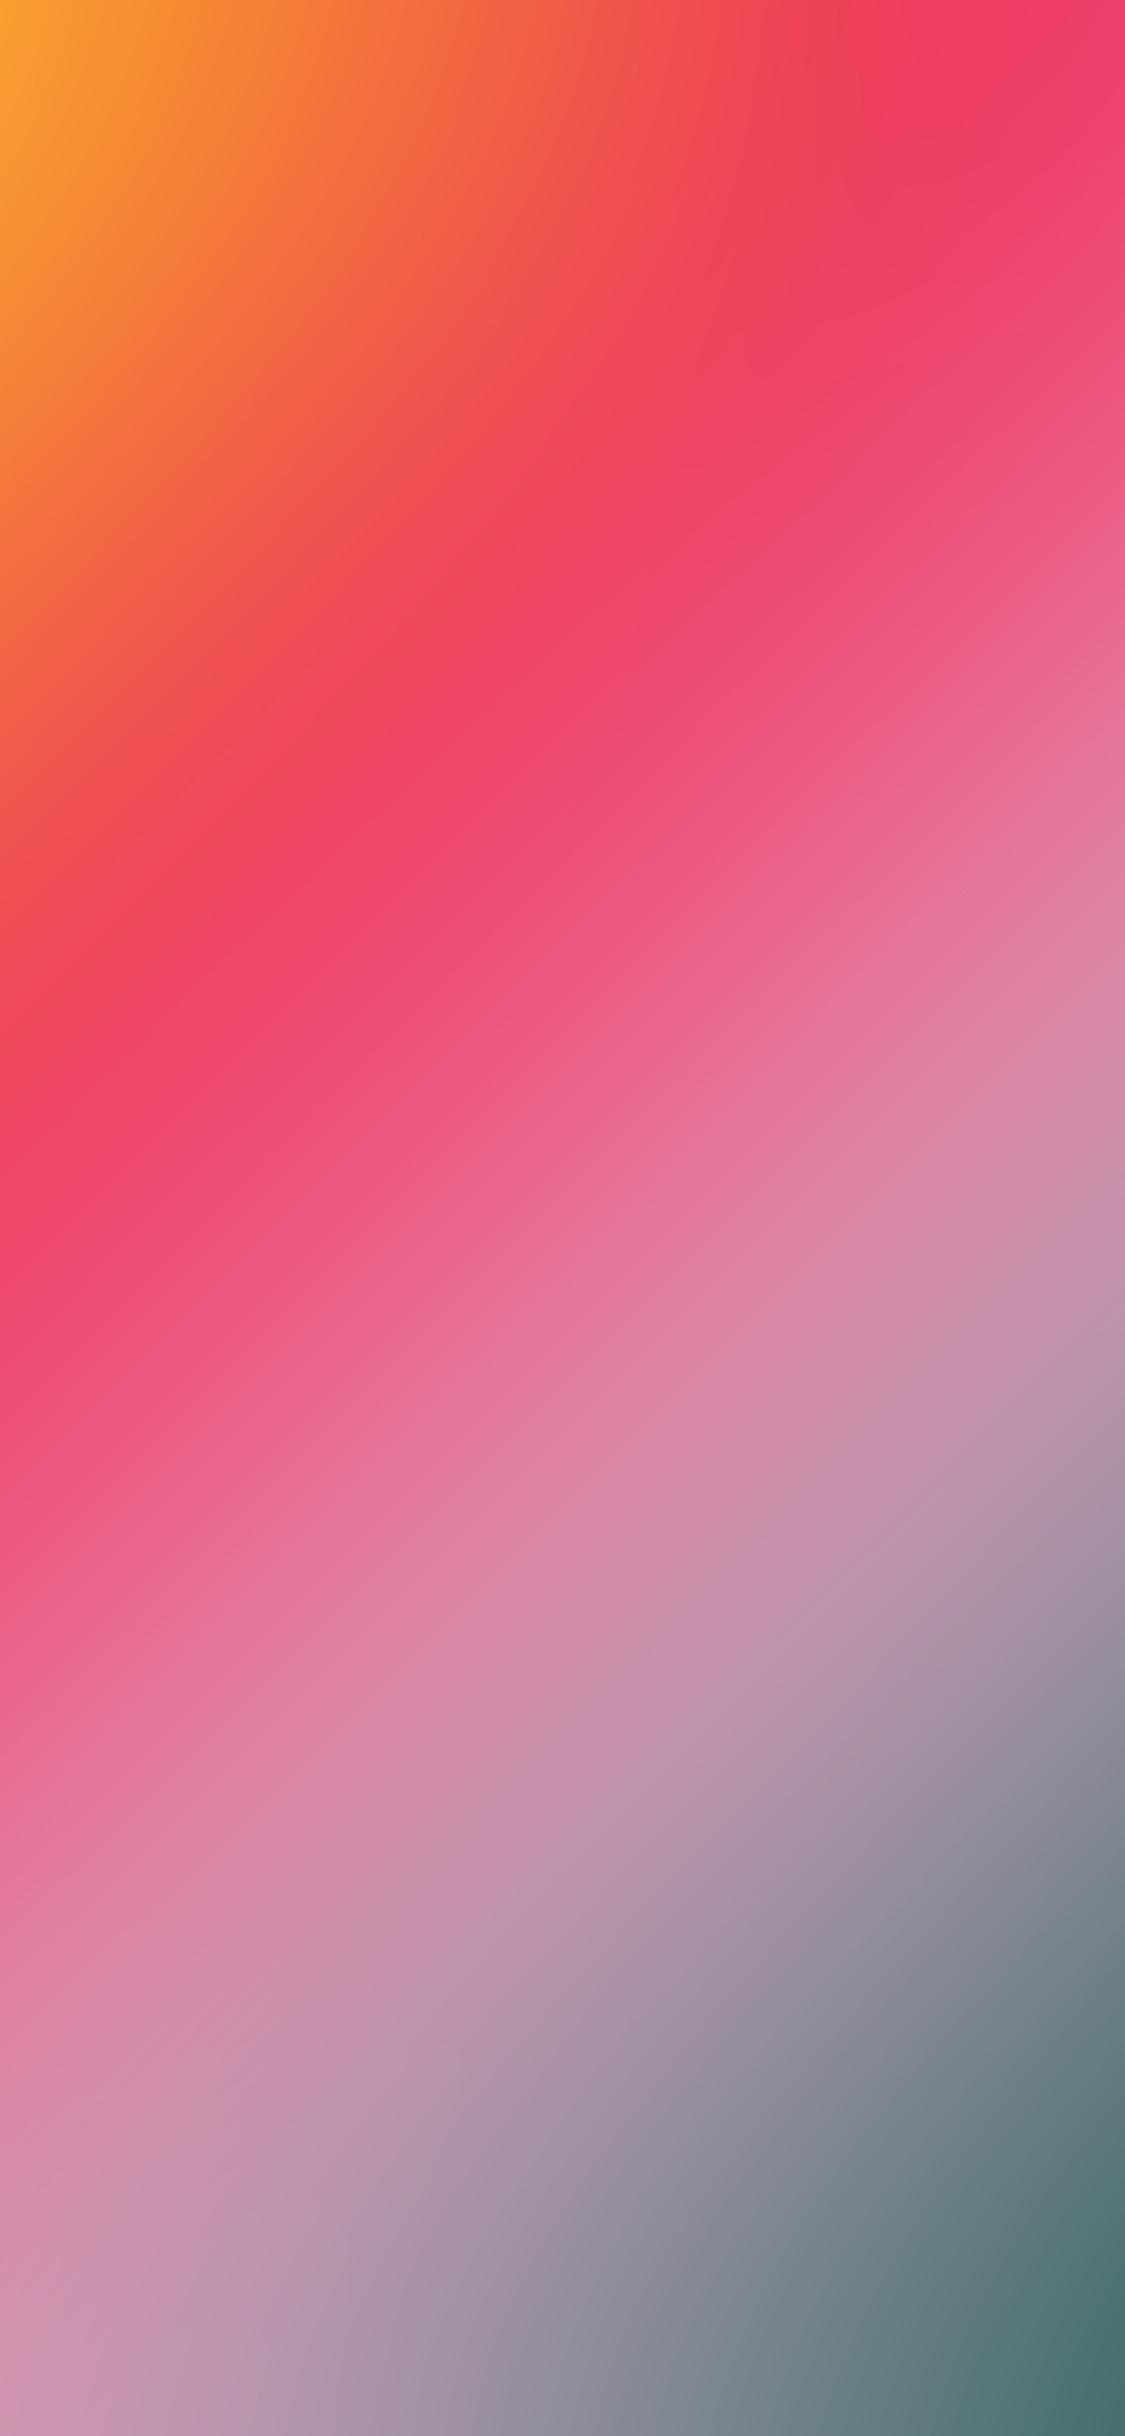 iPhoneXpapers.com-Apple-iPhone-wallpaper-sg17-pink-yellow-fluorescent-gradation-blur